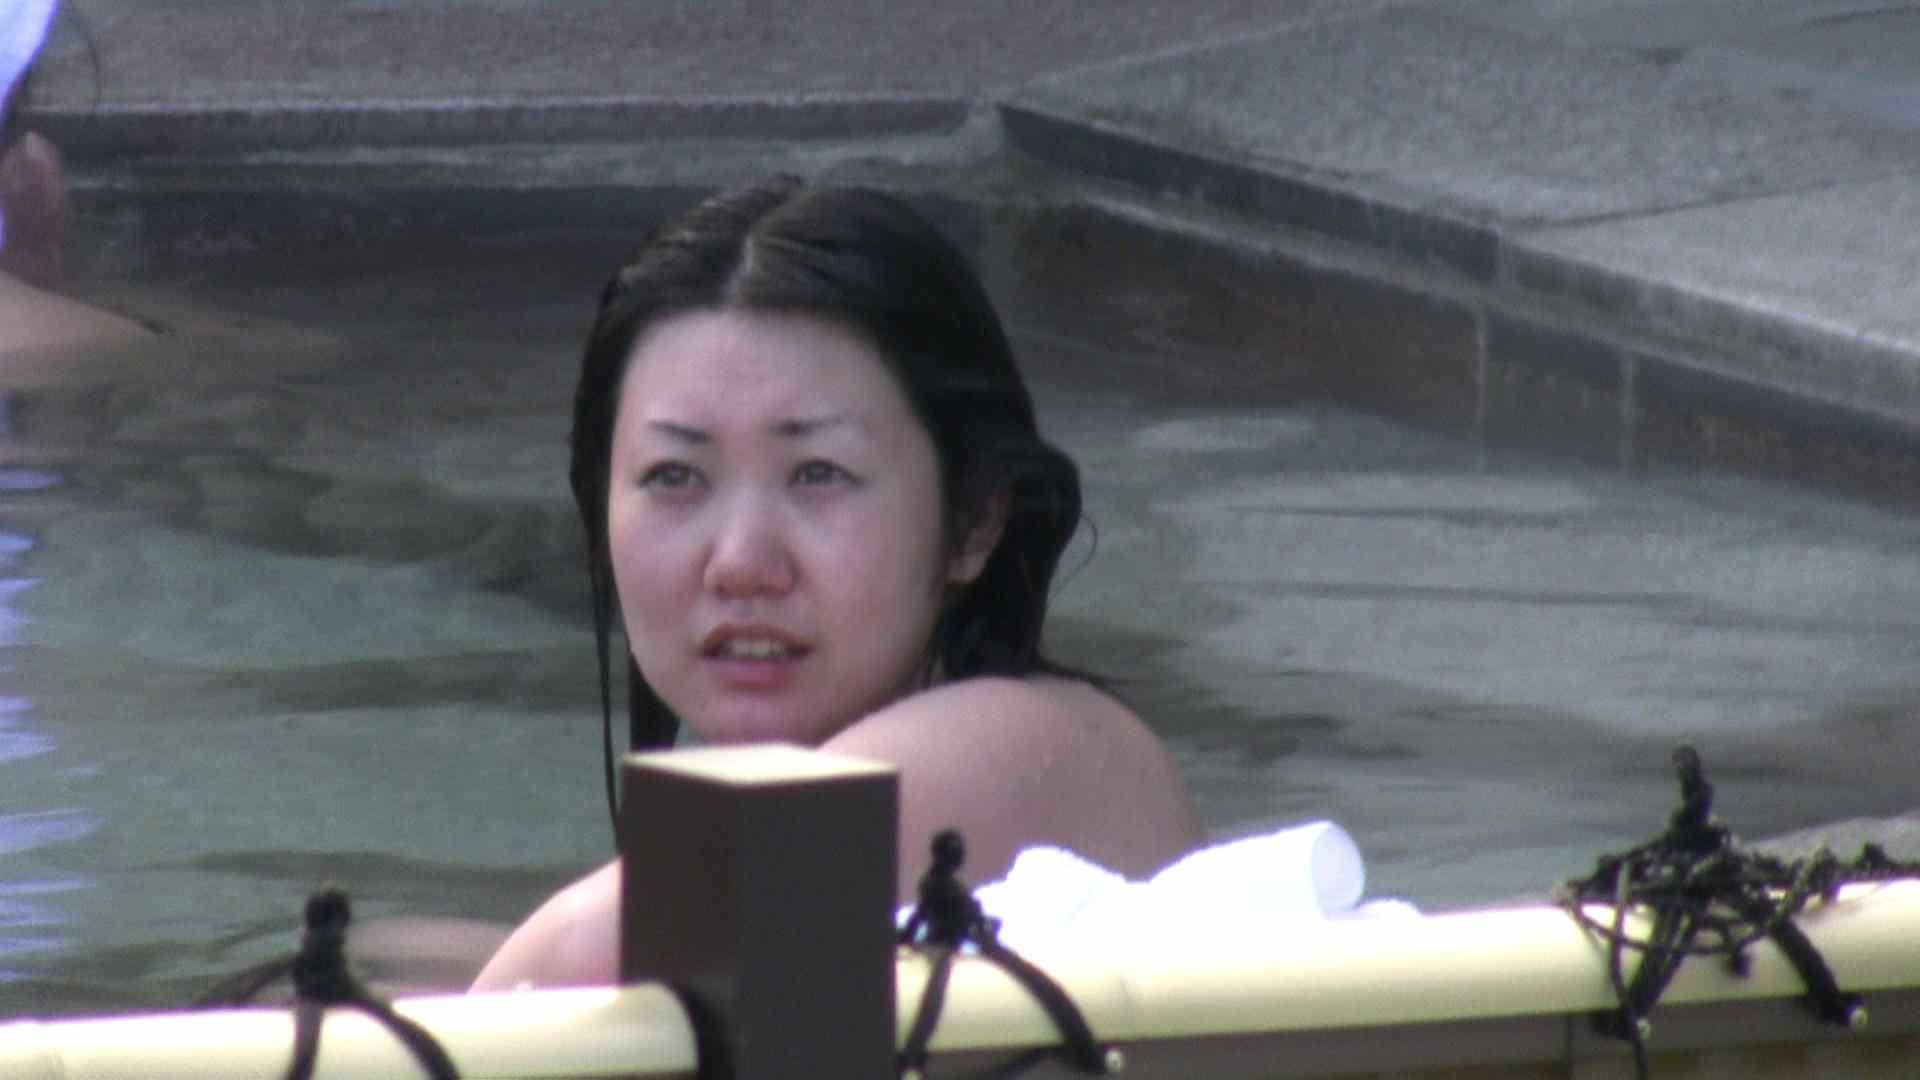 Aquaな露天風呂Vol.117 盗撮師作品  97pic 60